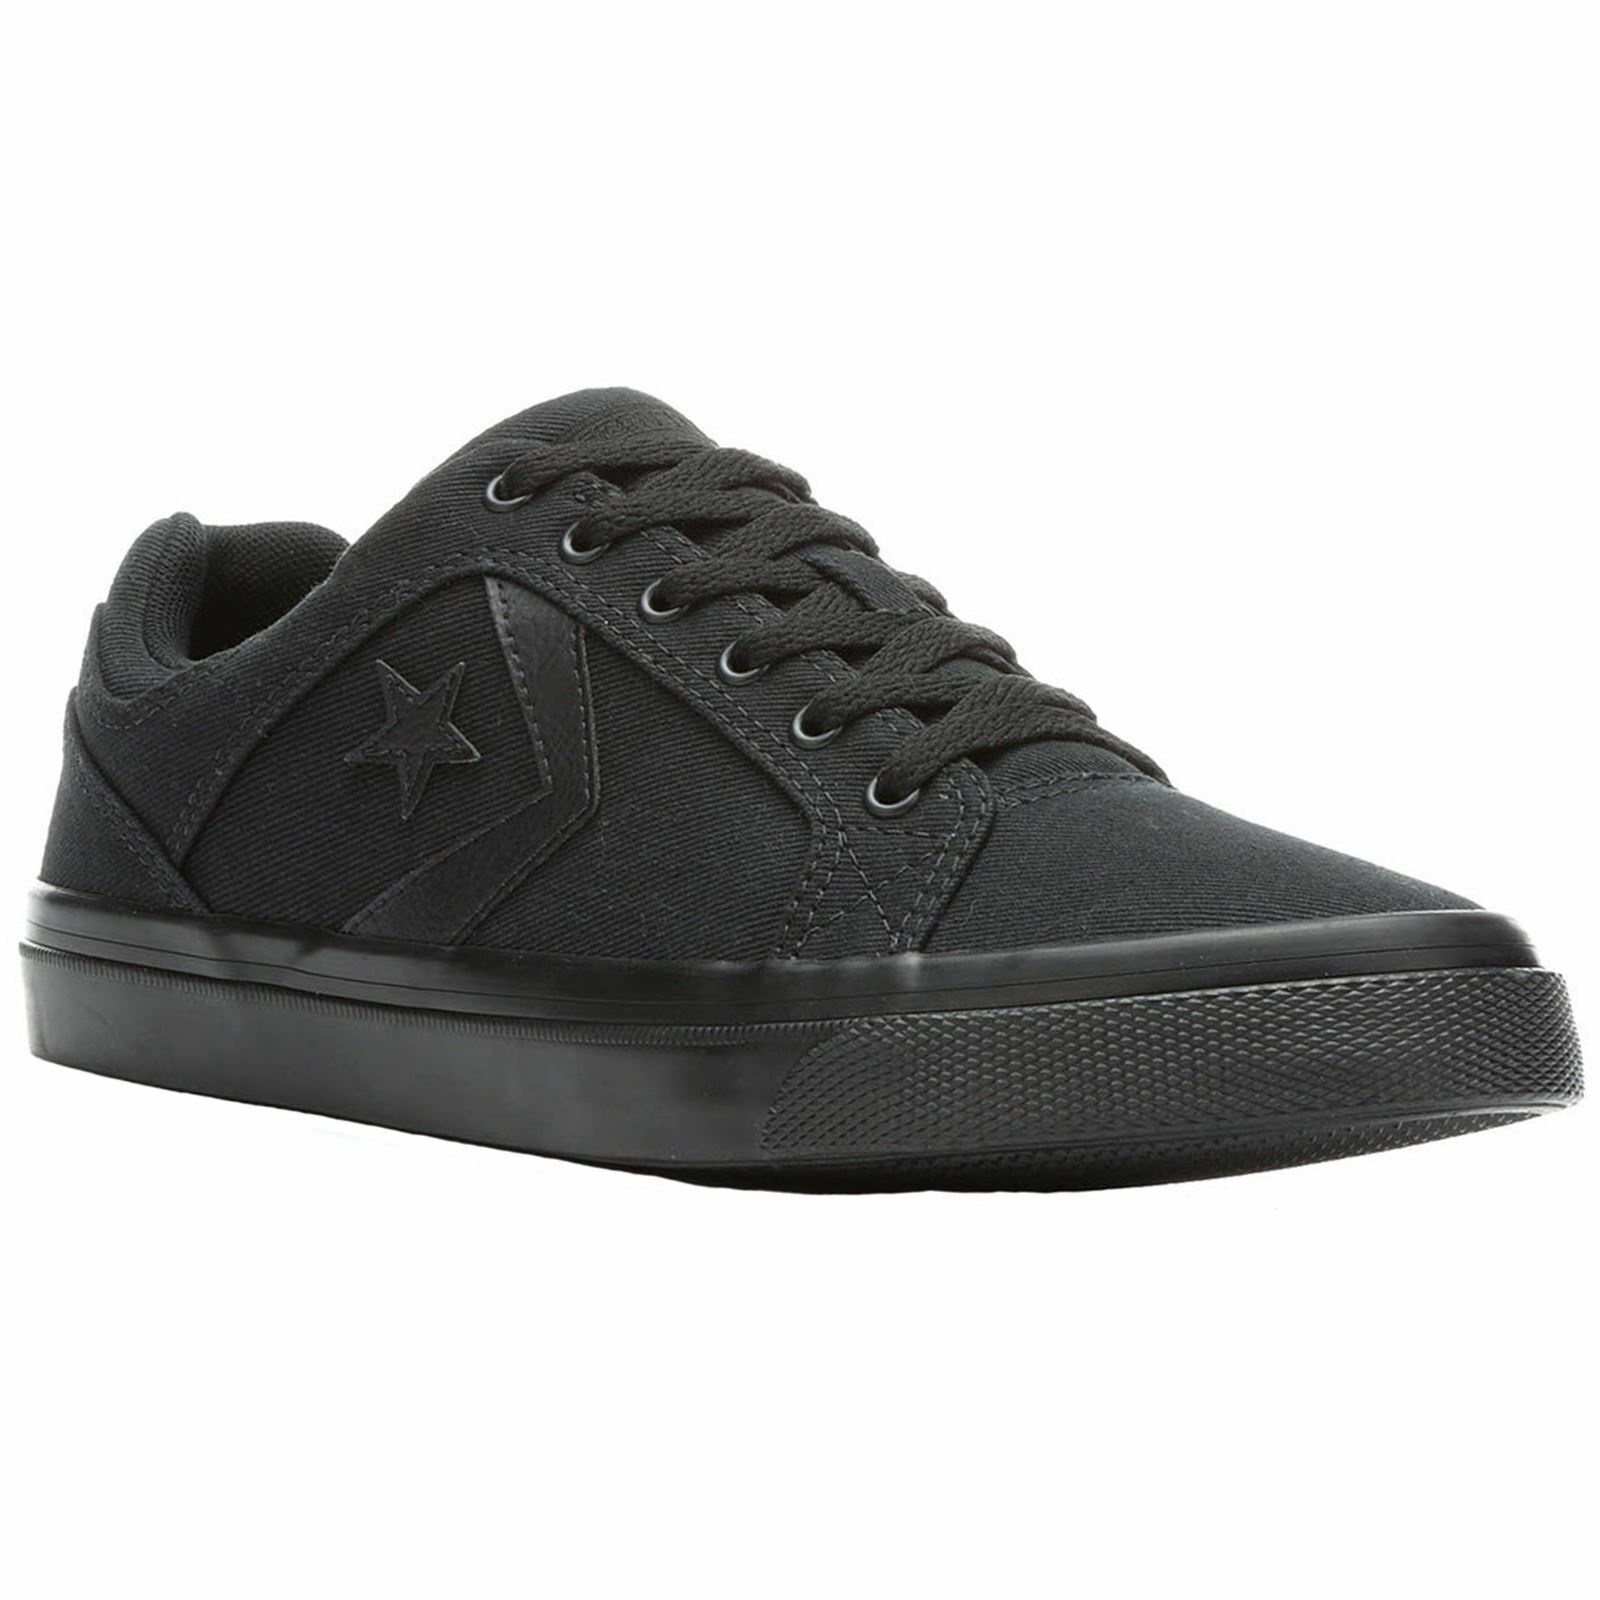 Converse El Low-top Distrito Ox Negro Hombre Canvas Low-top El Lace-Up Sneakers Trainers d83111